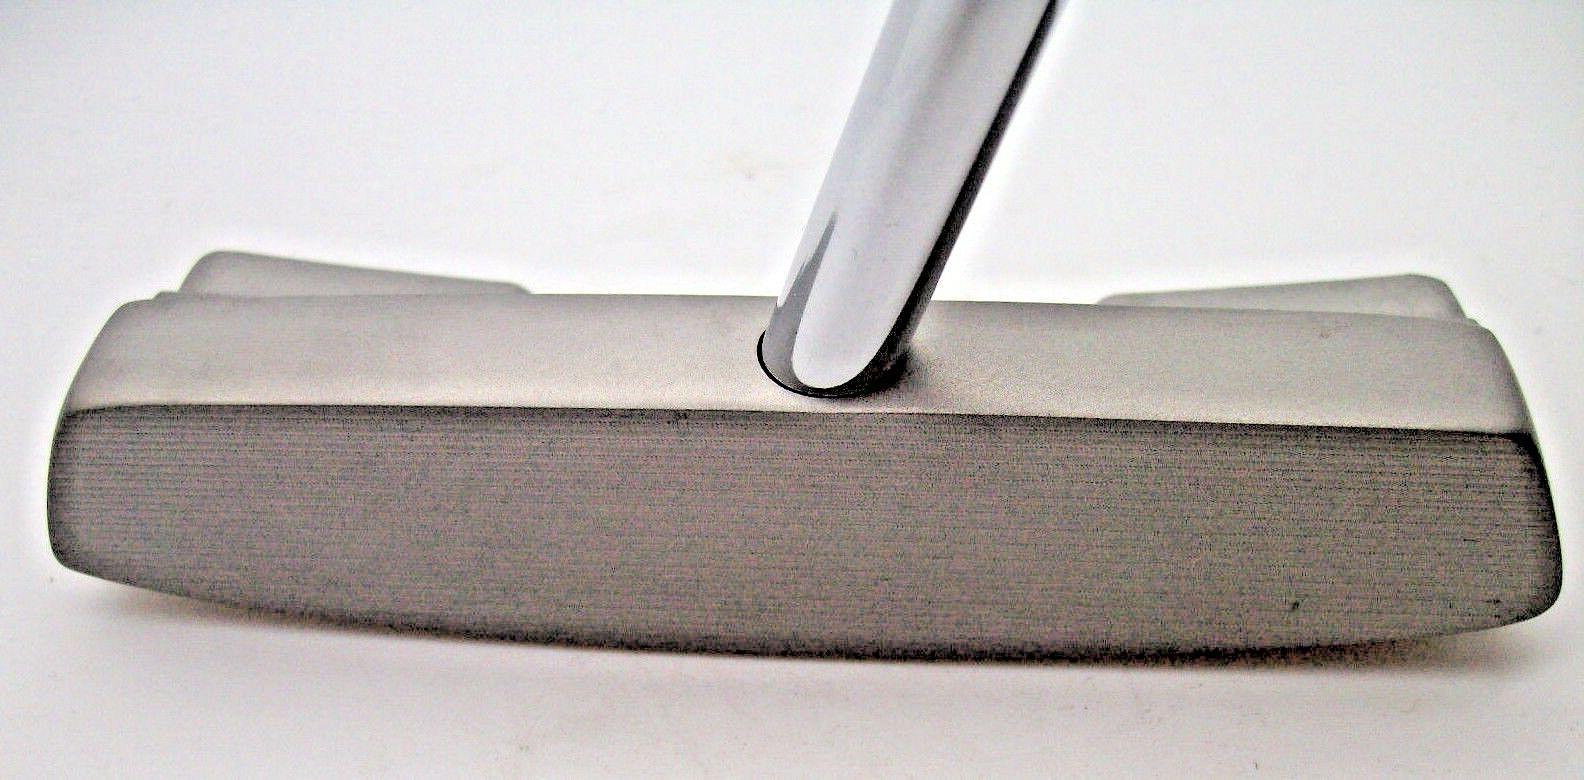 lefty heavy putter heel toe weighted design